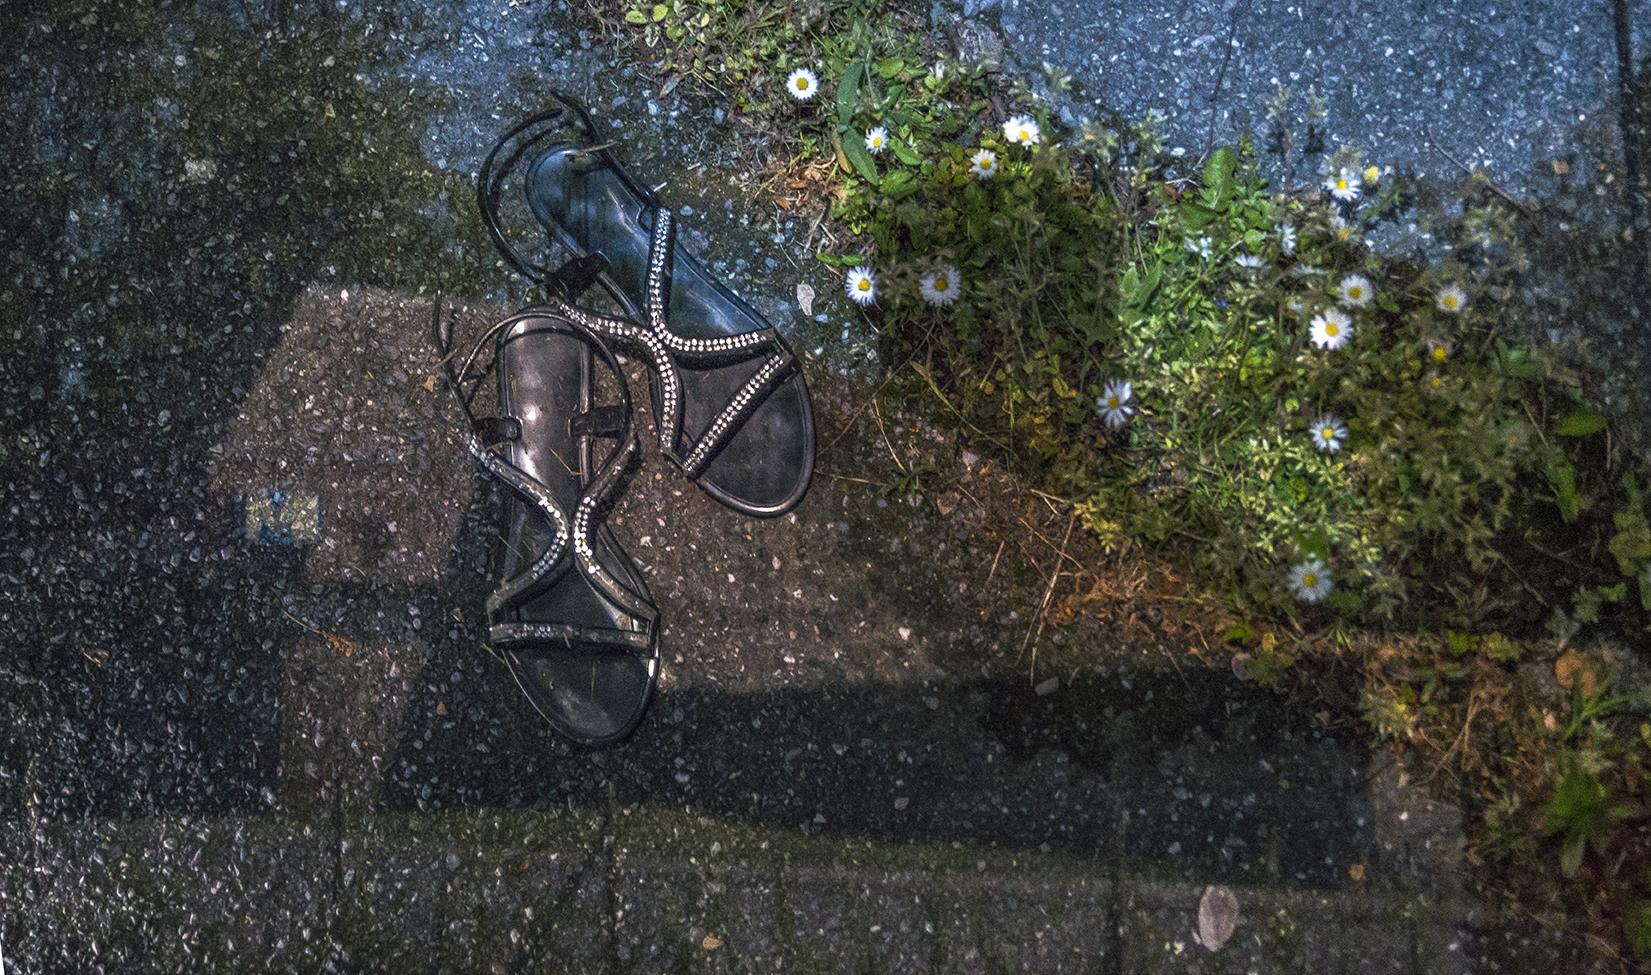 TFP_5204r Ghost Metro with sandals.jpg